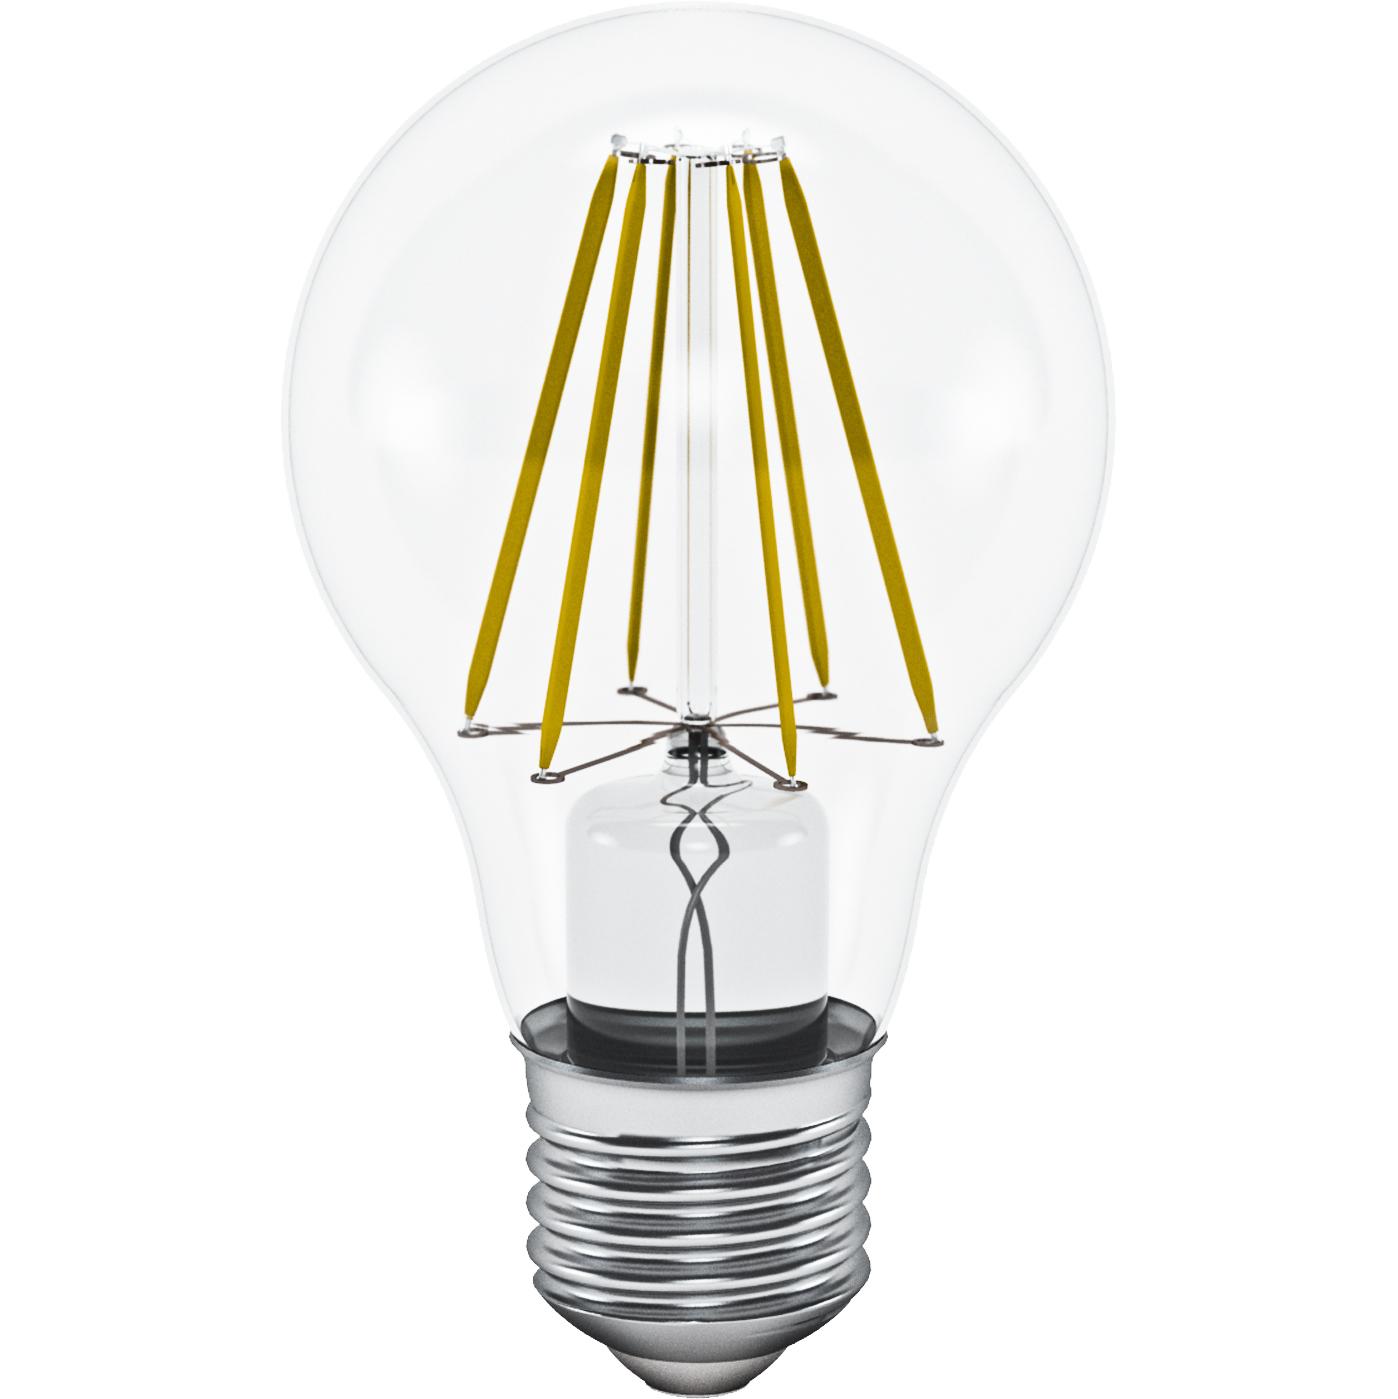 hpf2710_2_ Faszinierend Led Leuchtmittel E27 10w Dekorationen